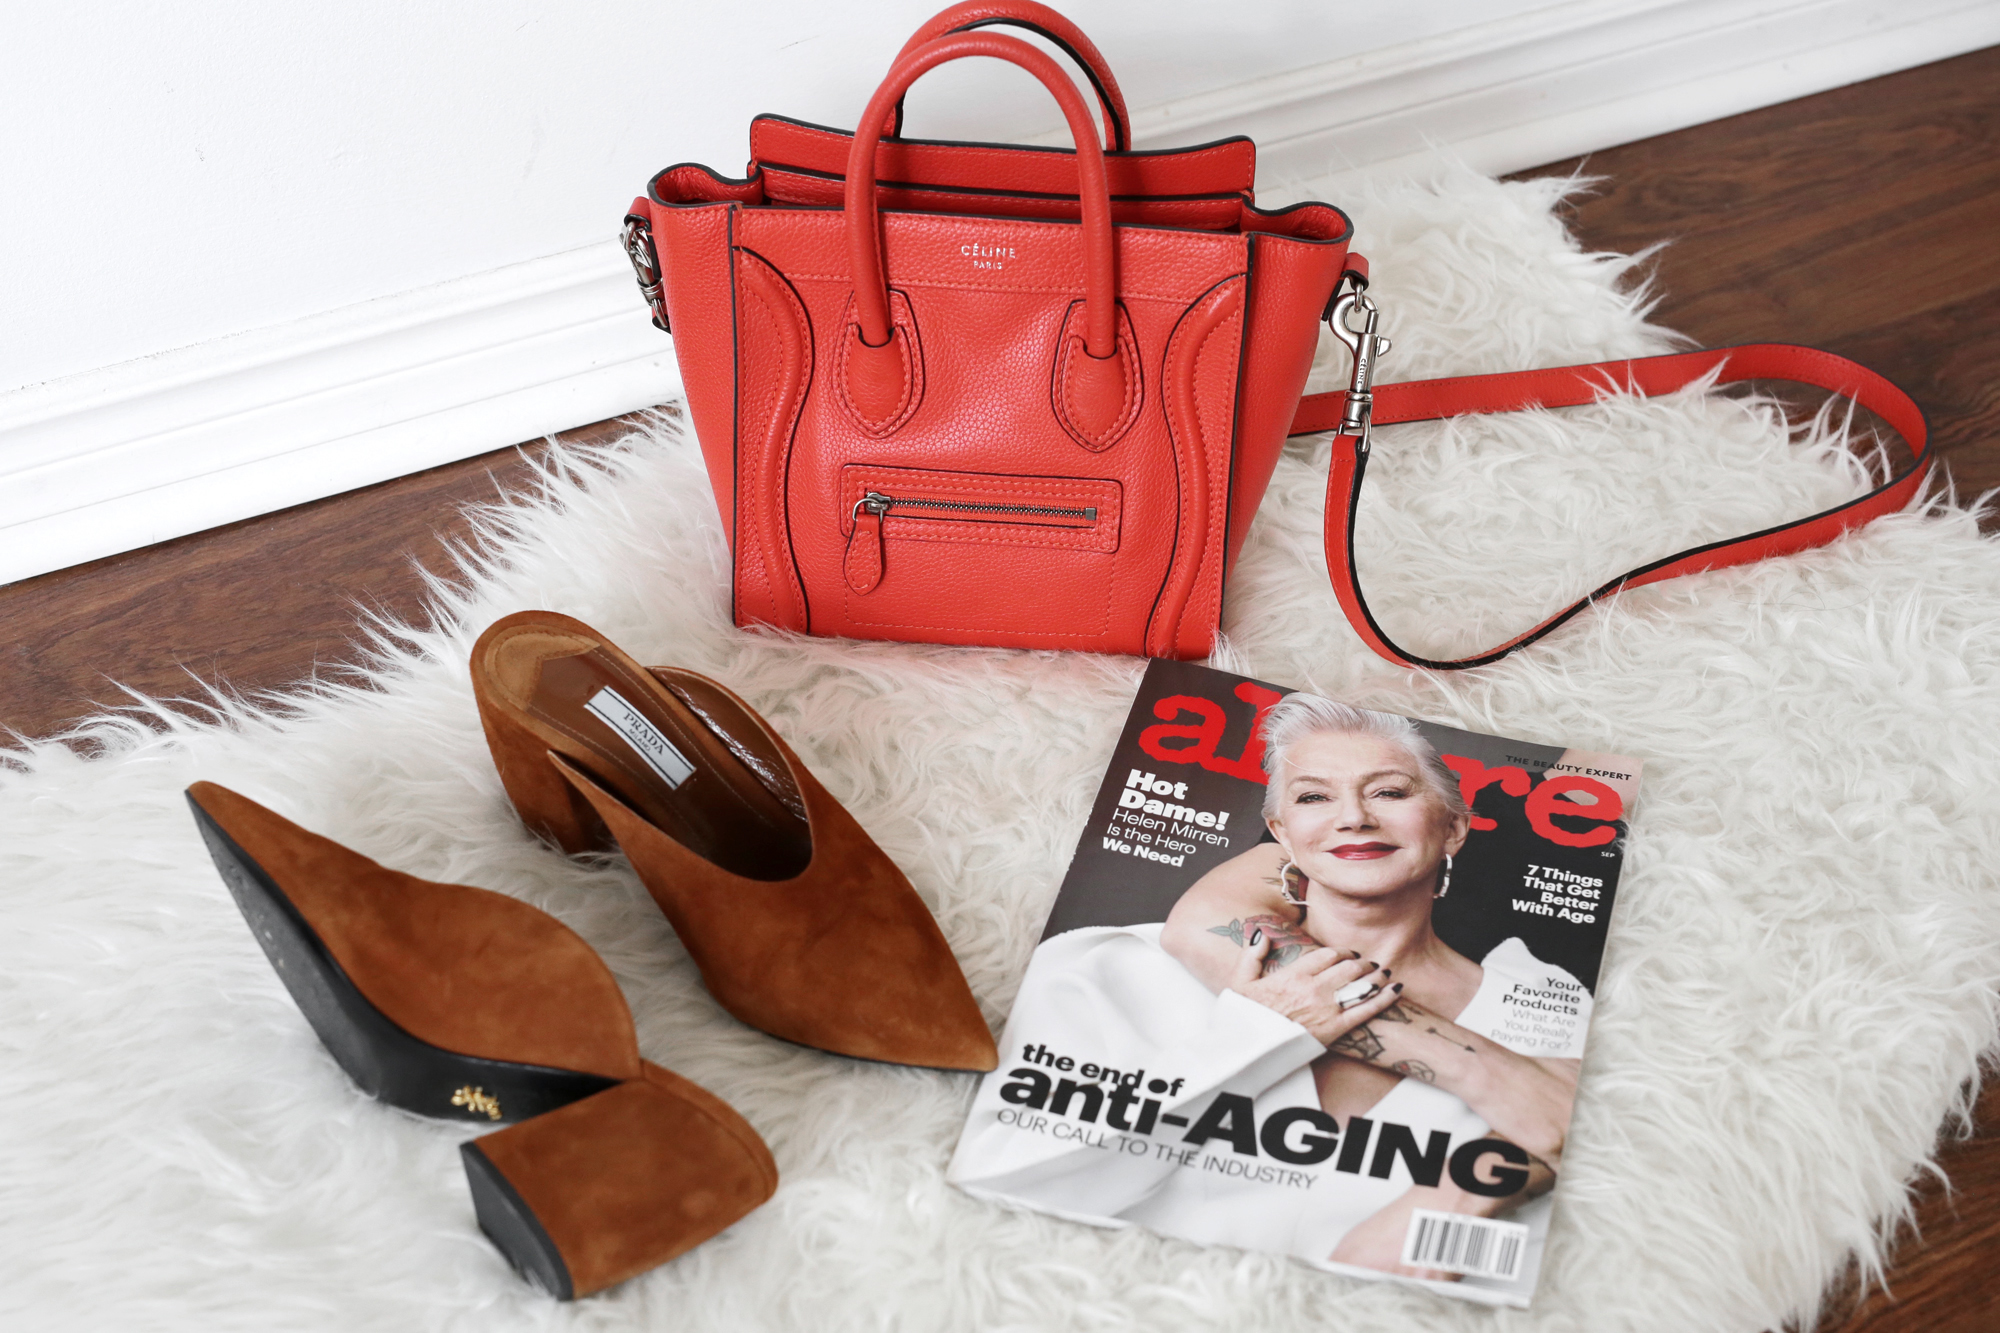 Fall 2017 Accessories - Celine Vermillion nano luggage bag and tobacco colored Prada mules _9128.jpg